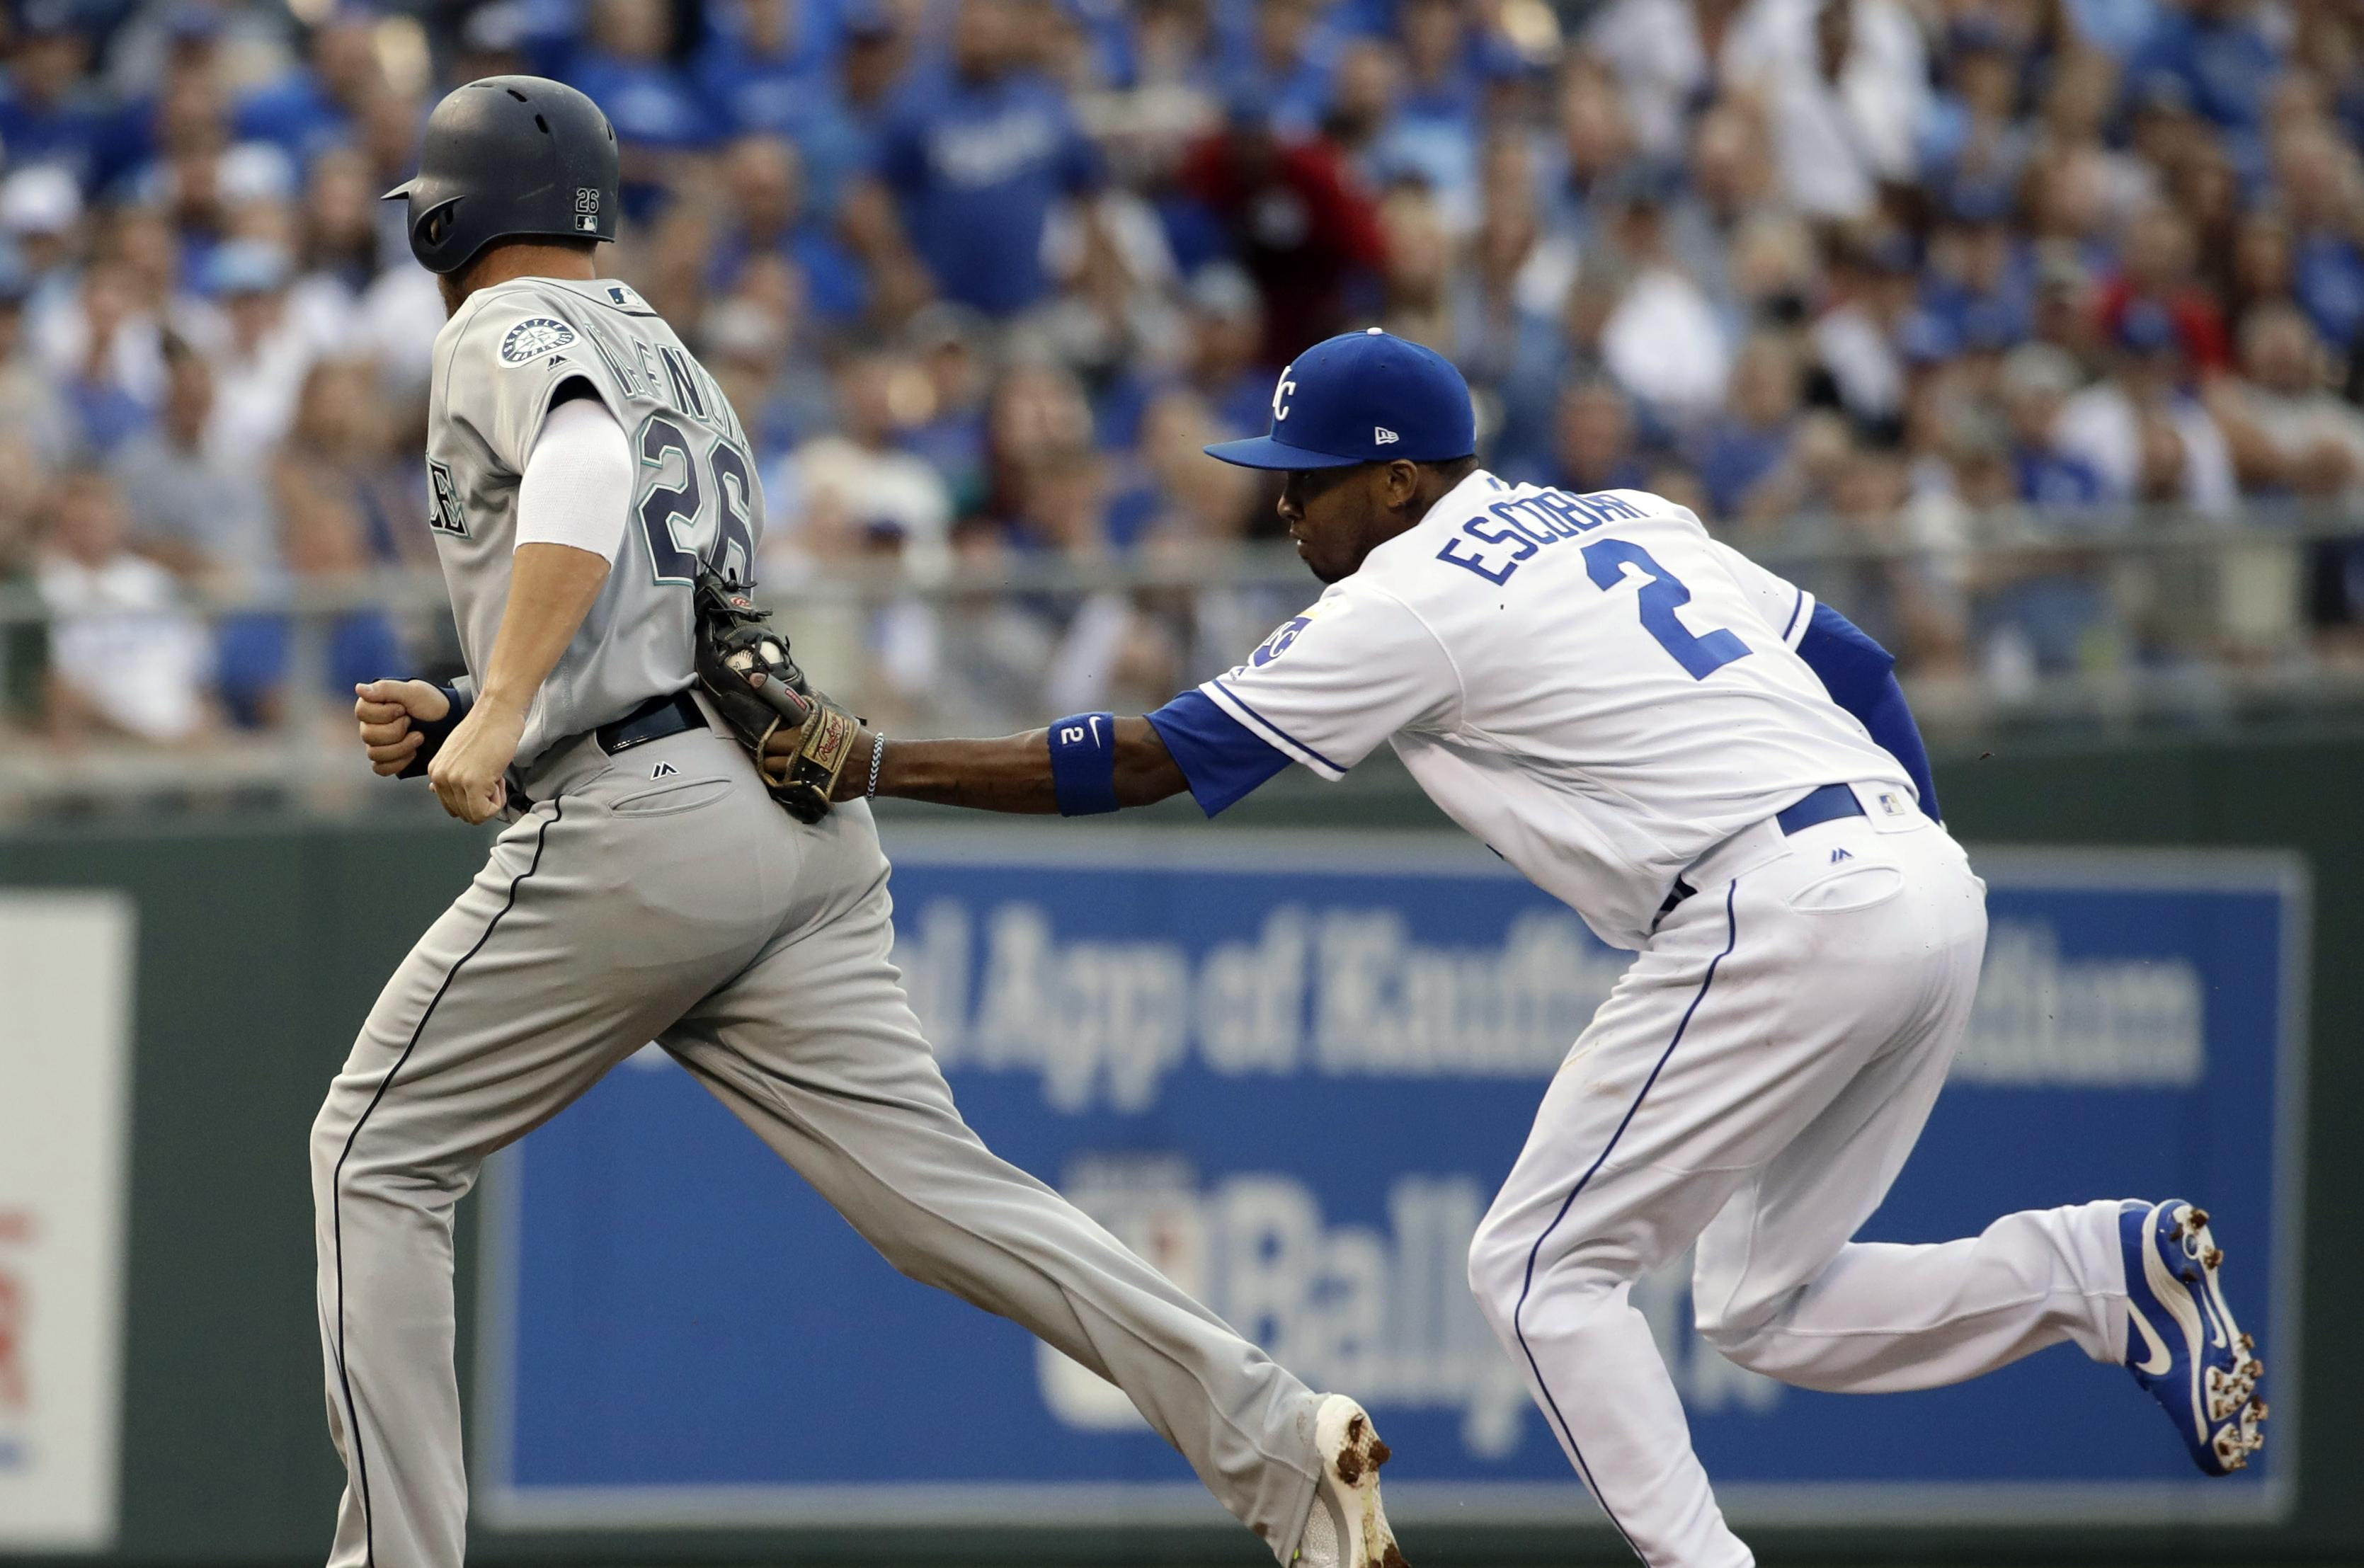 9372eb7bec5 Kansas City Royals shortstop Alcides Escobar (2) tags Seattle Mariners   Danny Valencia (